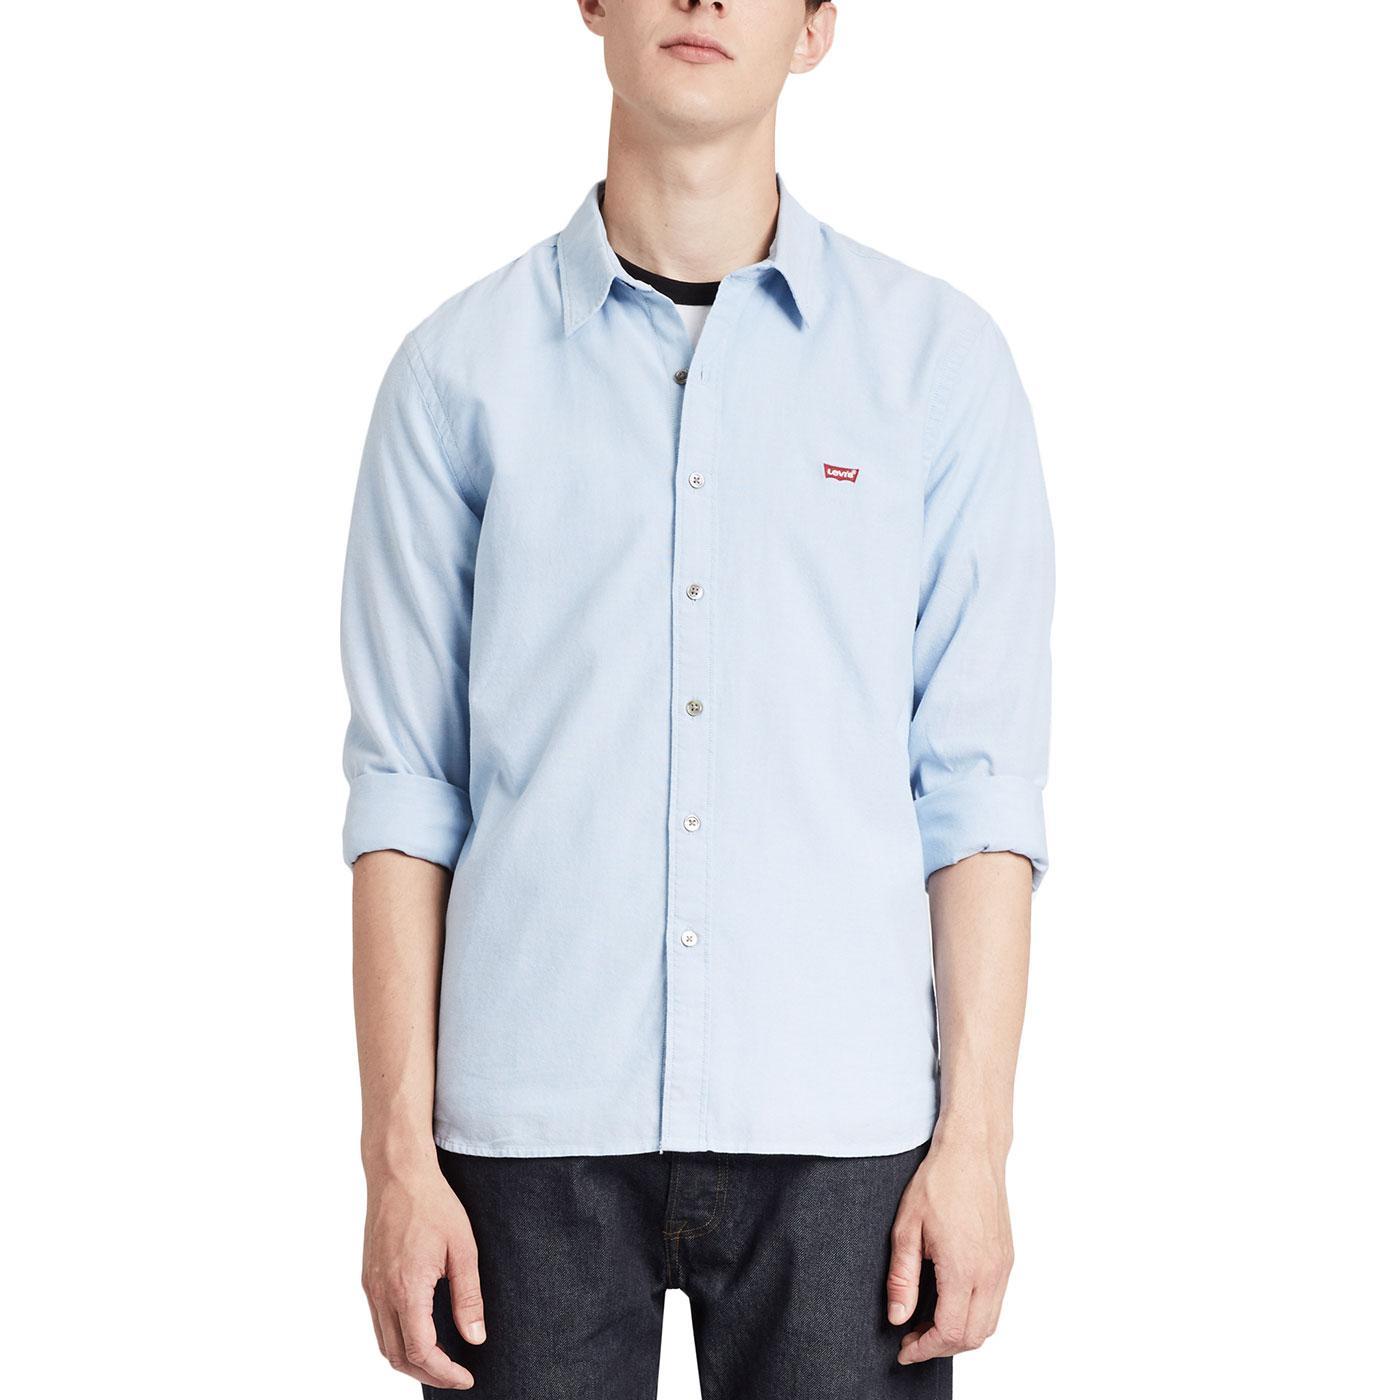 LEVI'S Battery HM Retro Mod Oxford Shirt (Allure)